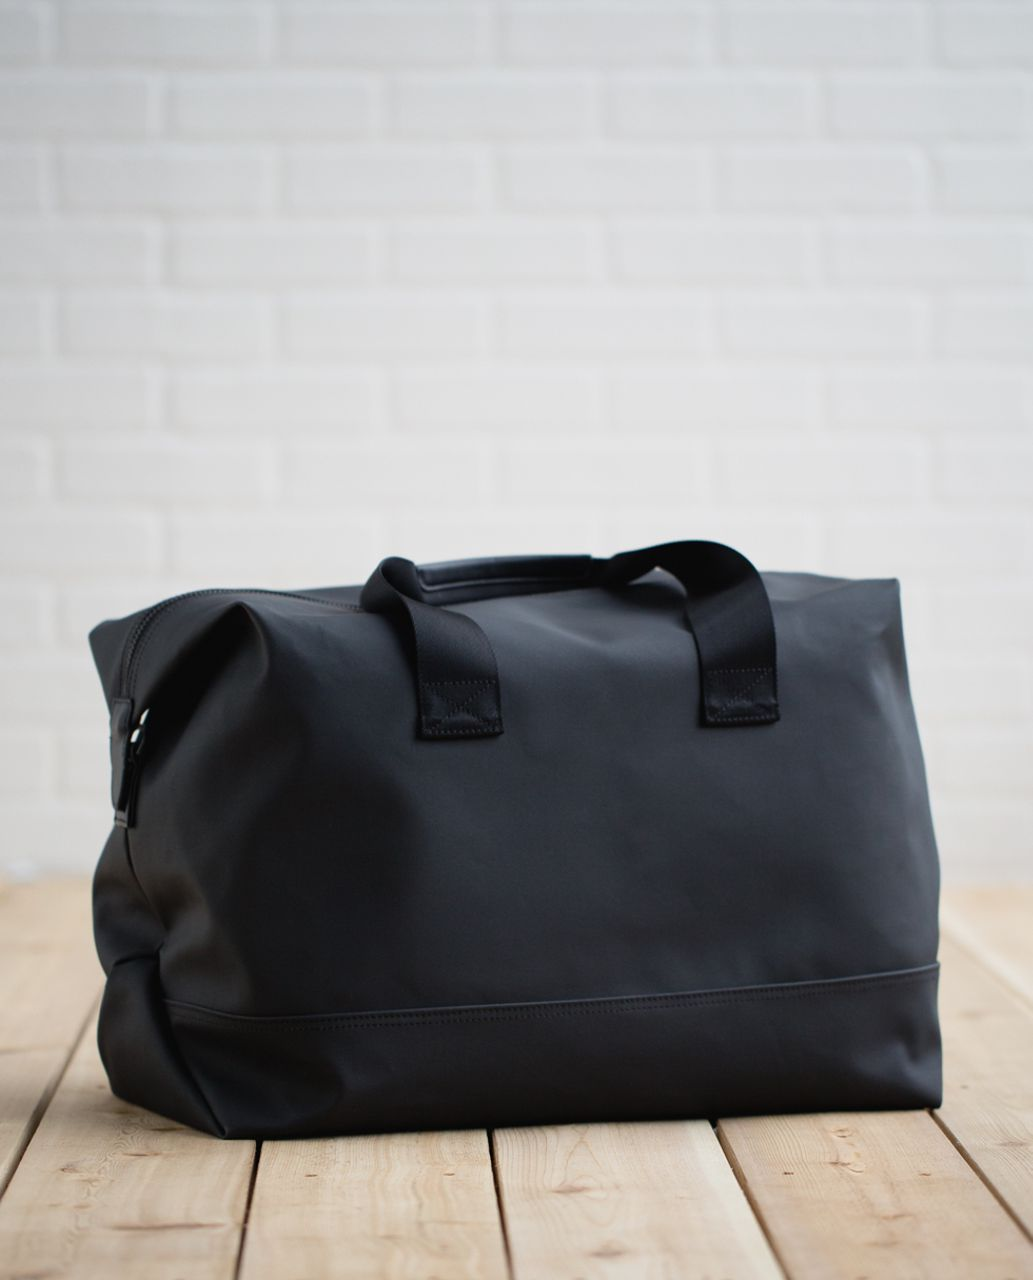 lululemon everyday bag black lulu fanatics